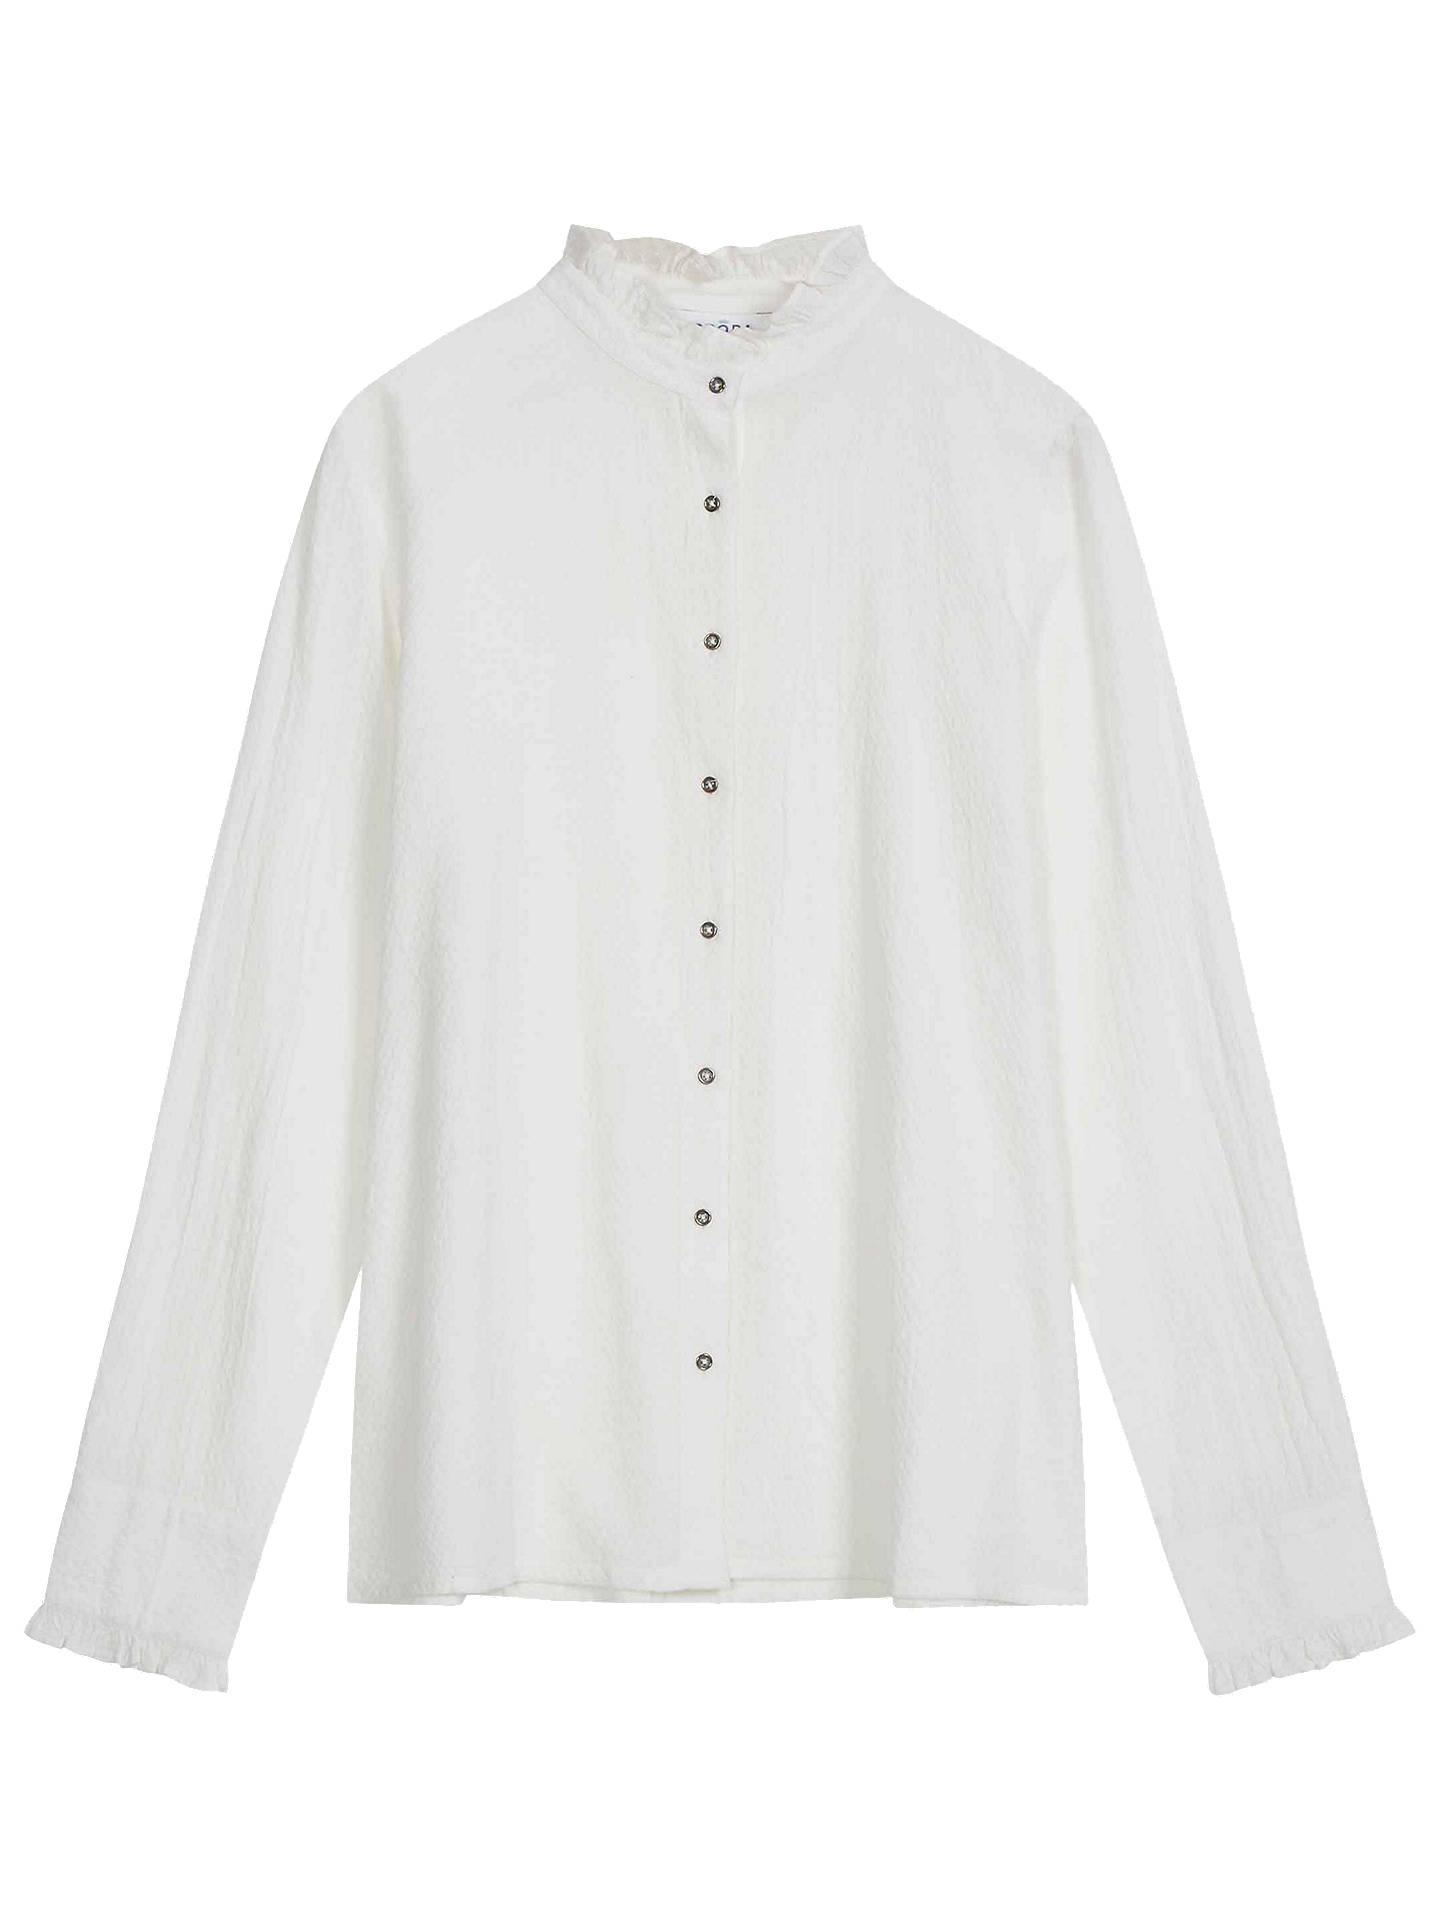 e89c3796e2cba9 ... Buy Brora Textured Cotton Frill Shirt, White, 6 Online at johnlewis.com  ...